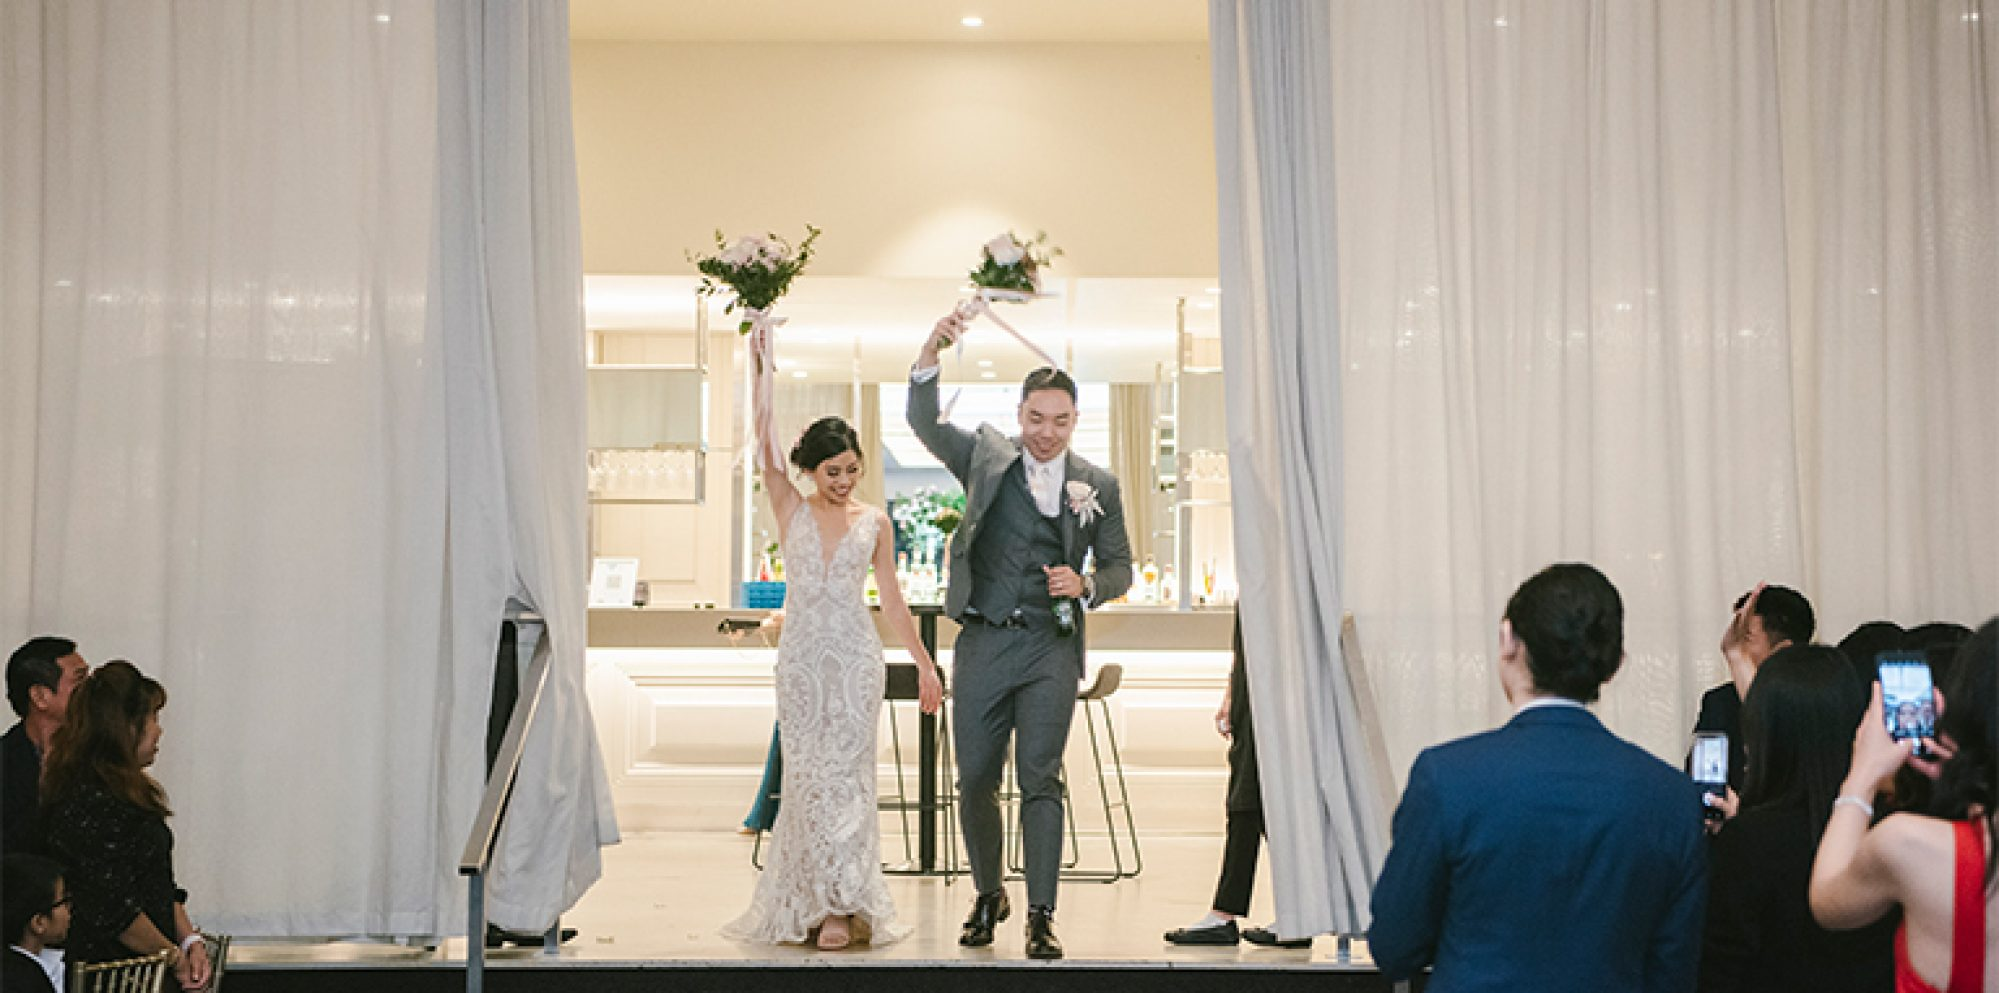 Mary & jeff wedding video @ leonda by the yarra